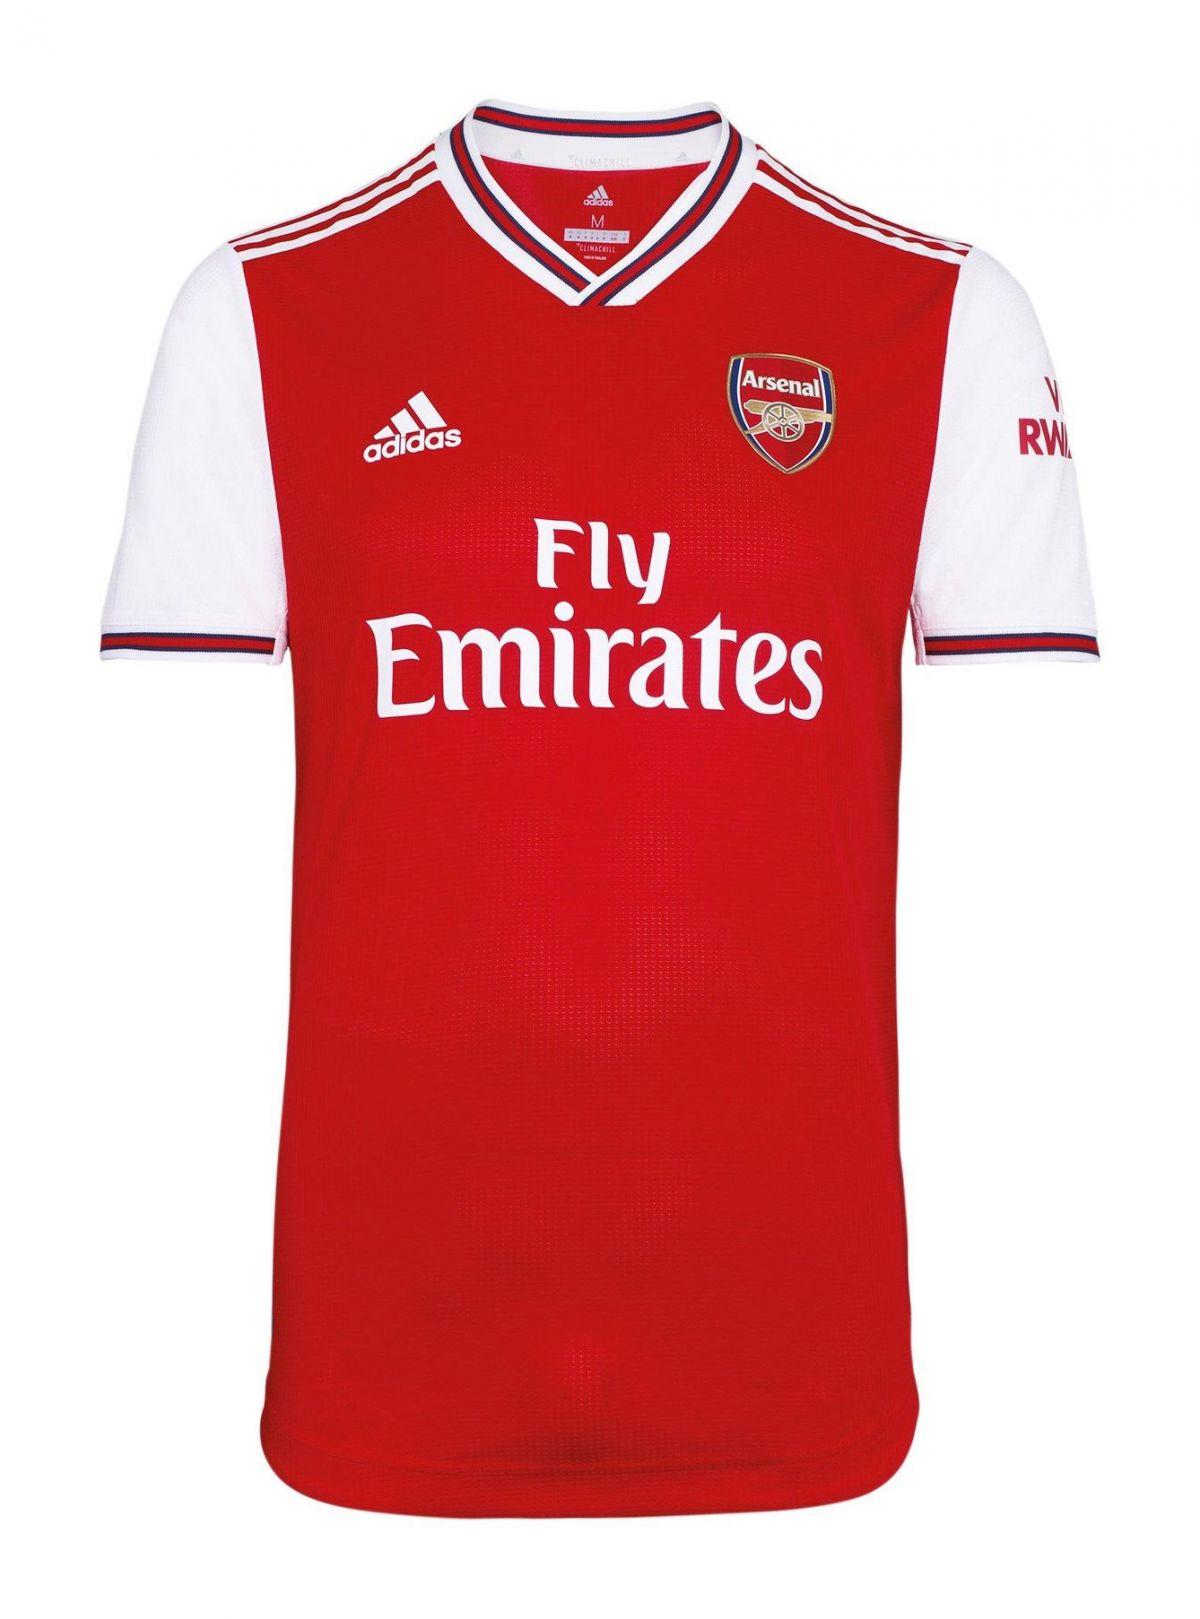 Arsenal Fc 2019 20 Home Kit